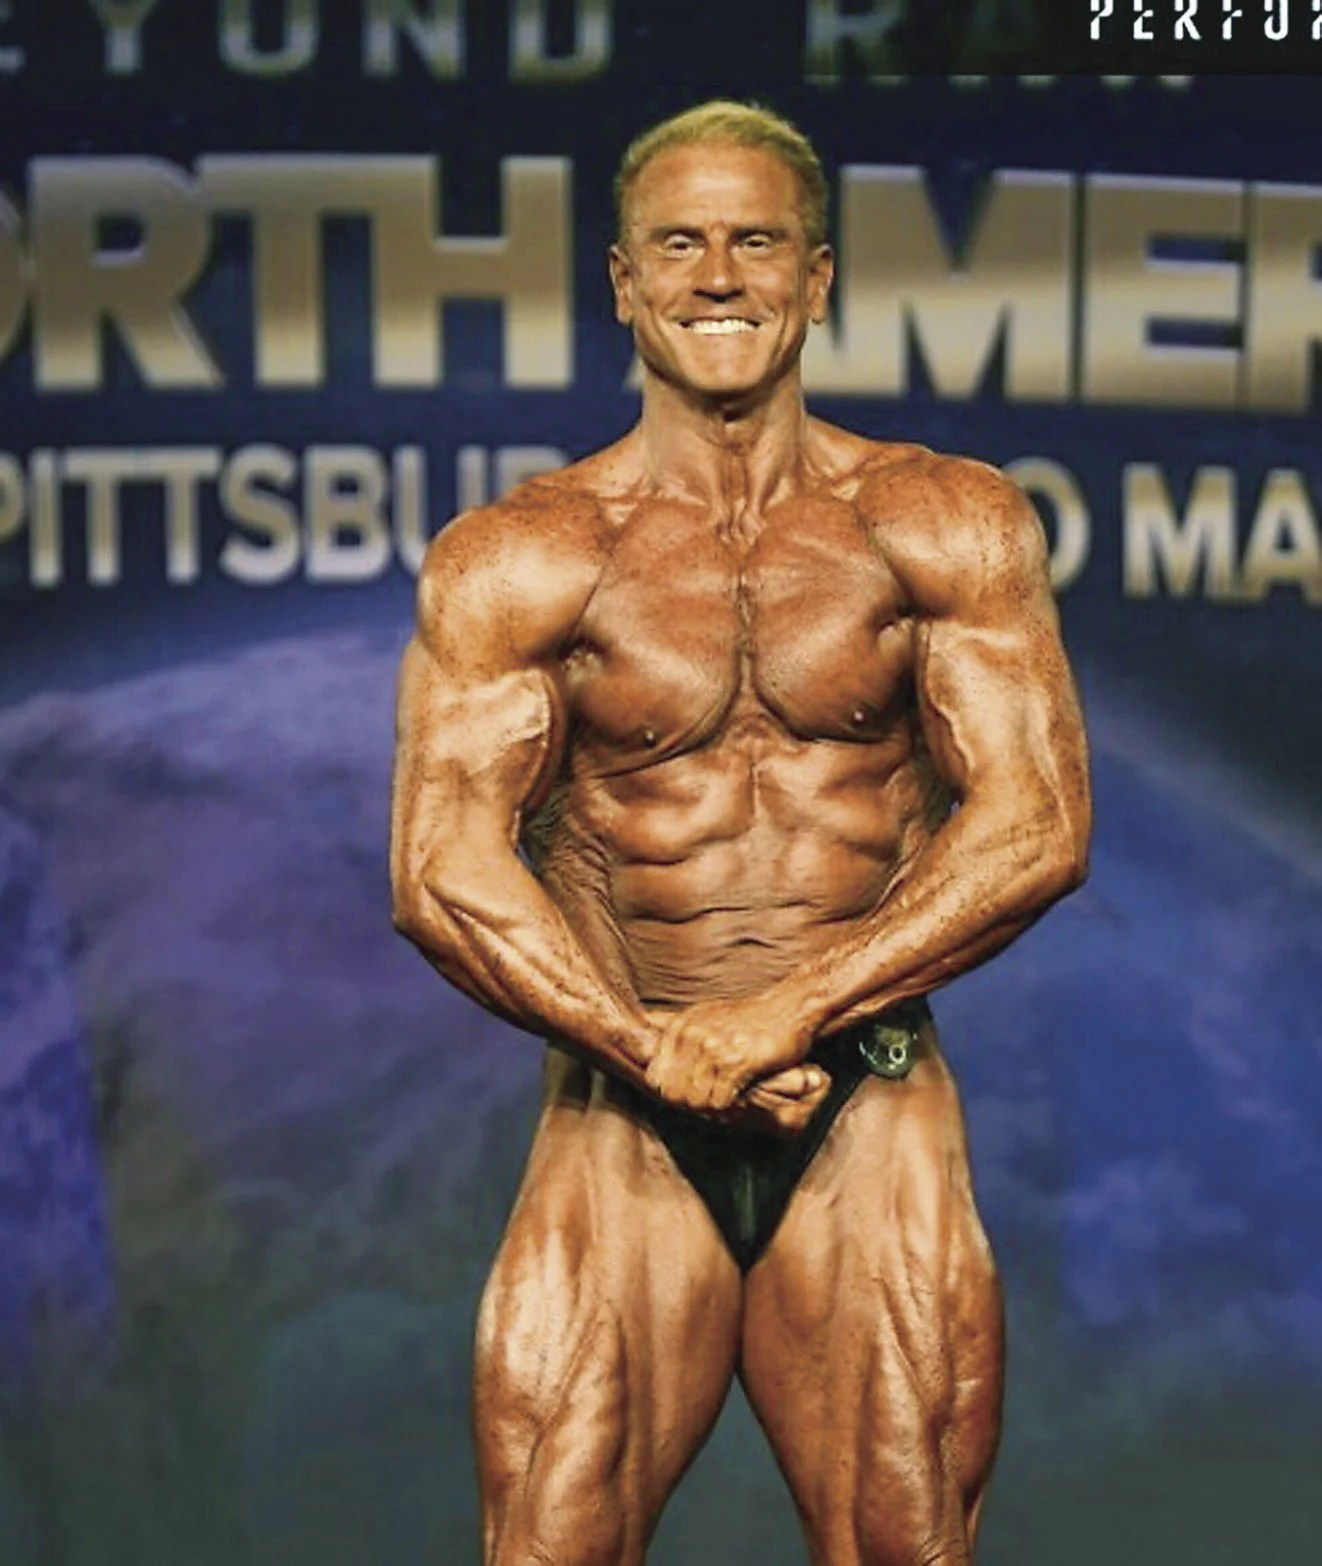 Daytona Bodybuilder Going Strong At 60 News